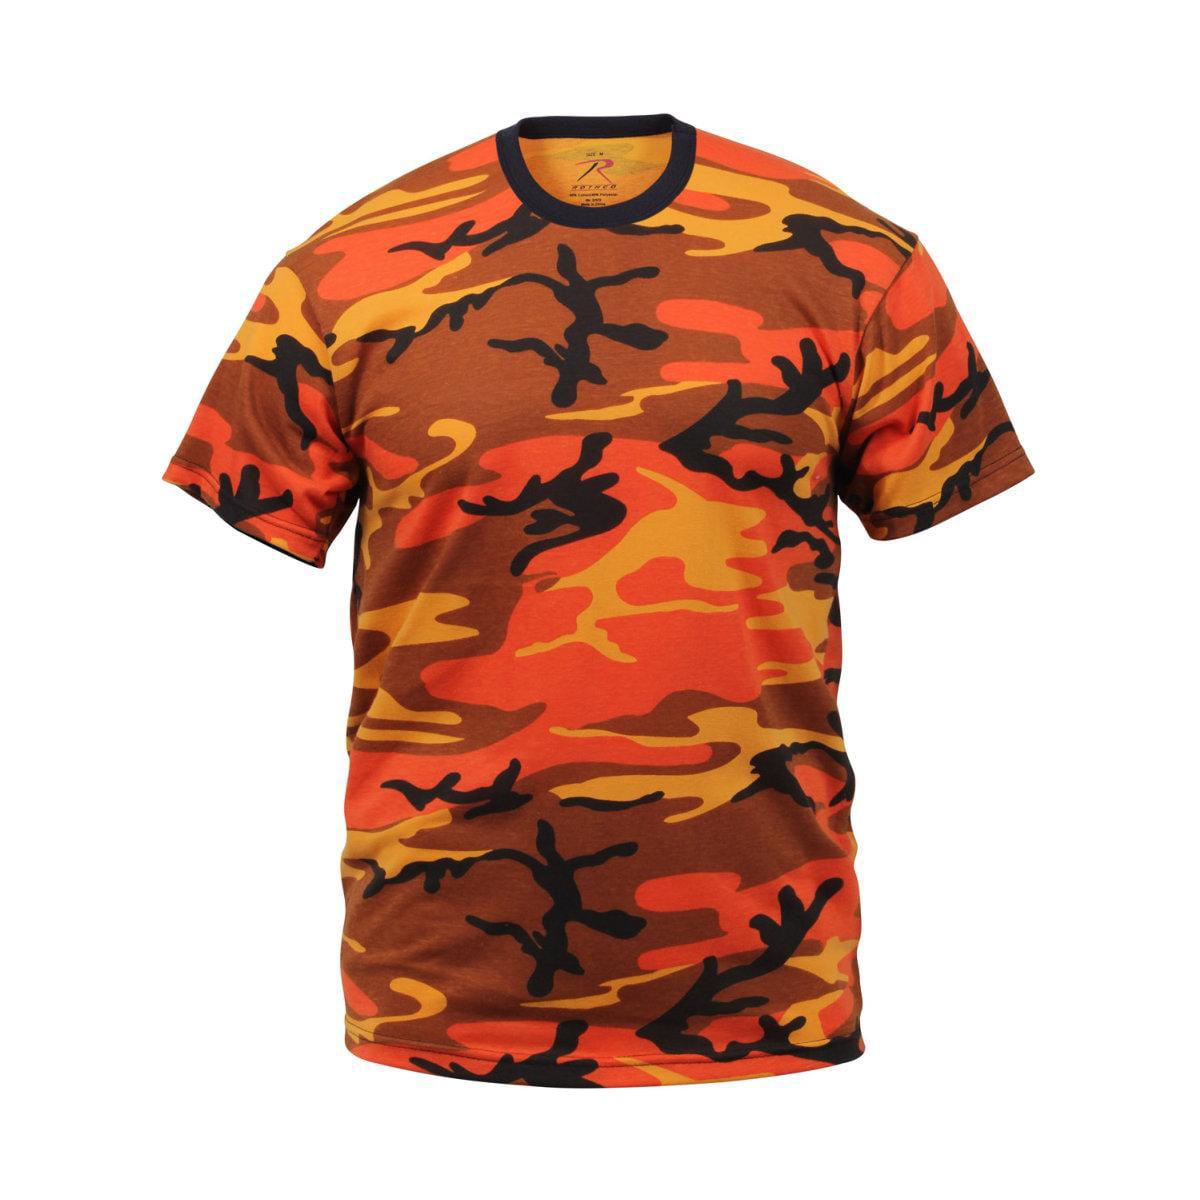 Savage Orange Camouflage T-Shirt